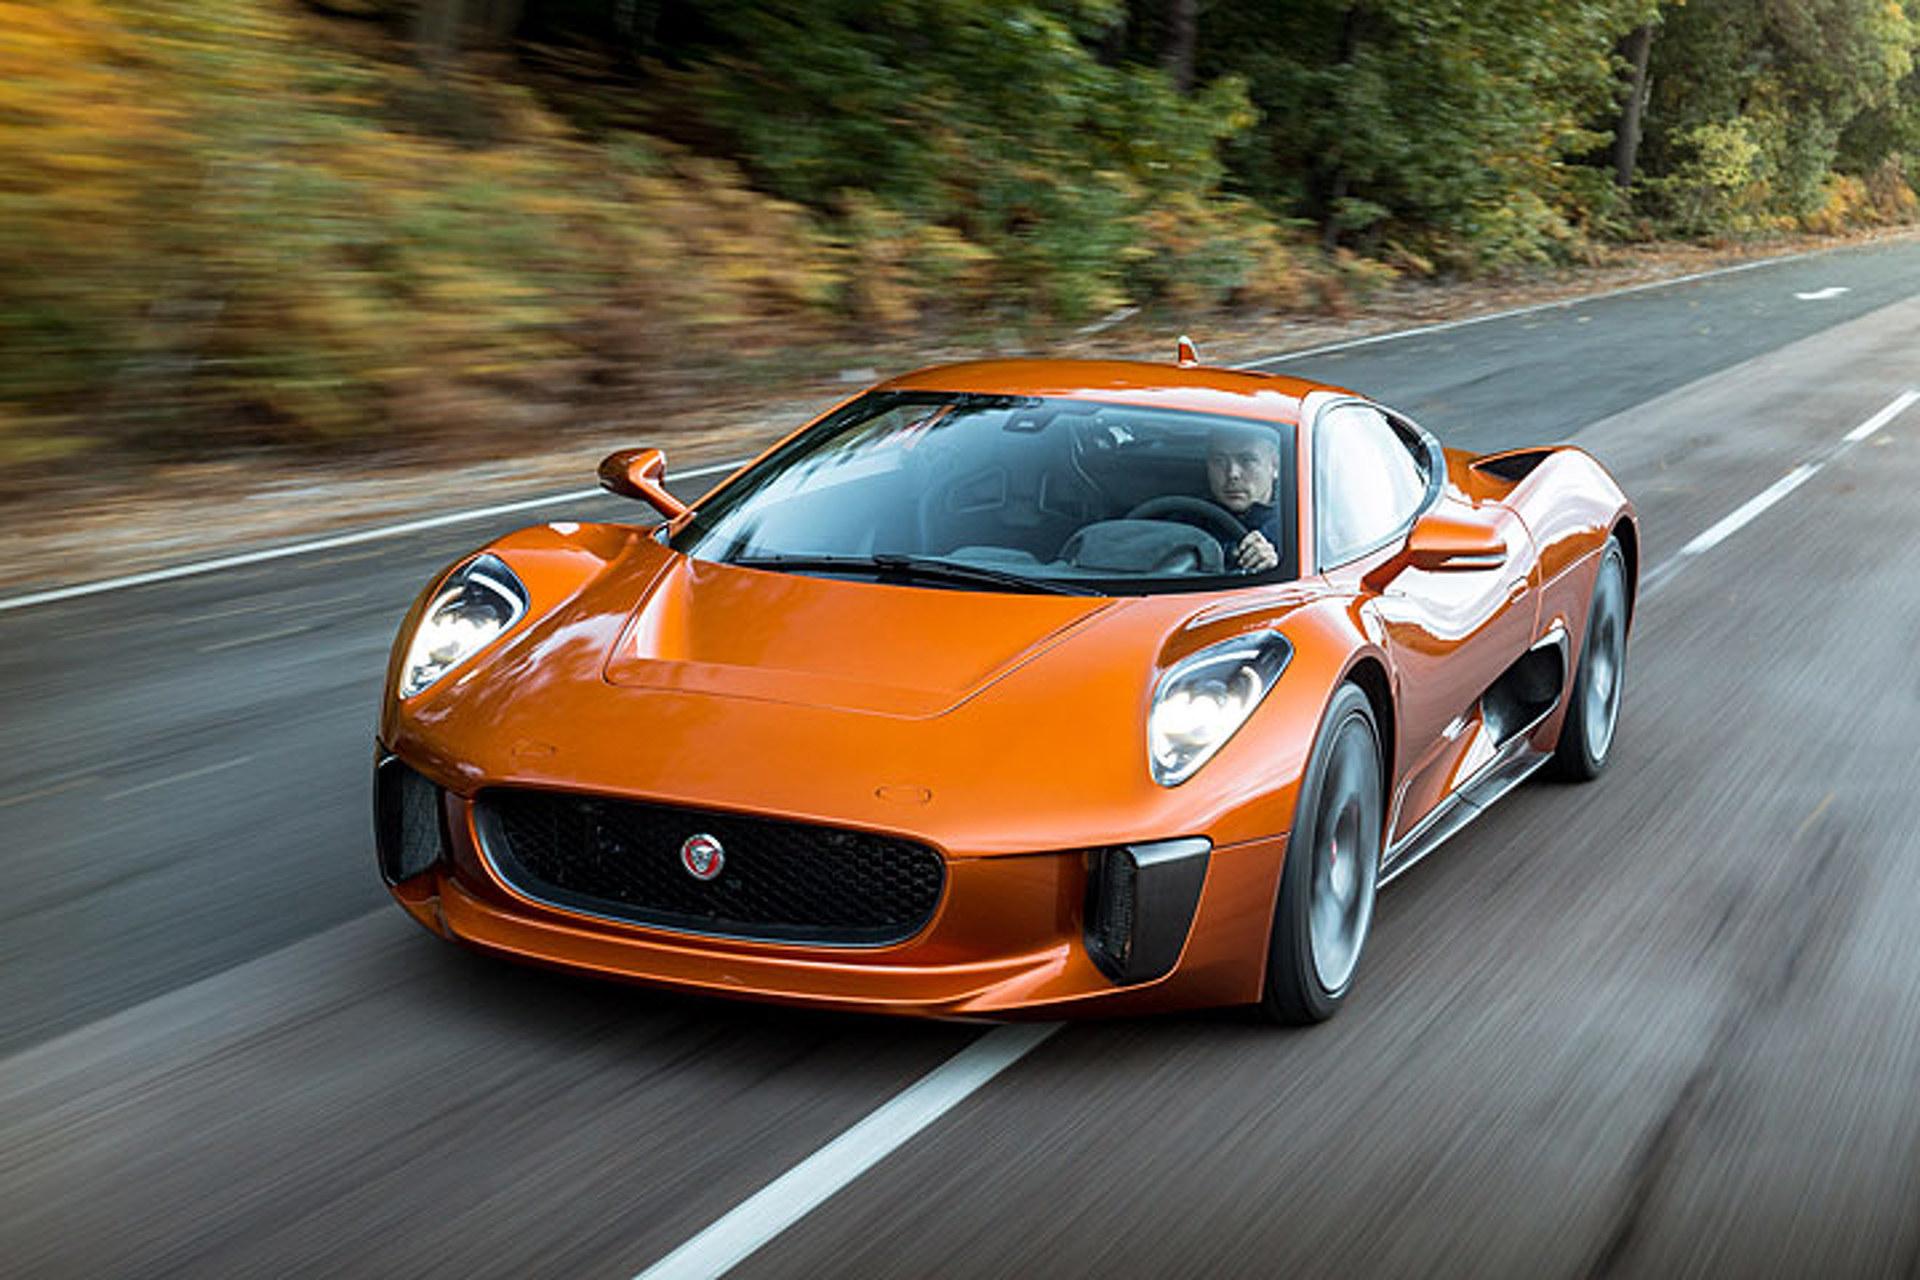 Watch an F1 Star Go Wild in a James Bond Car